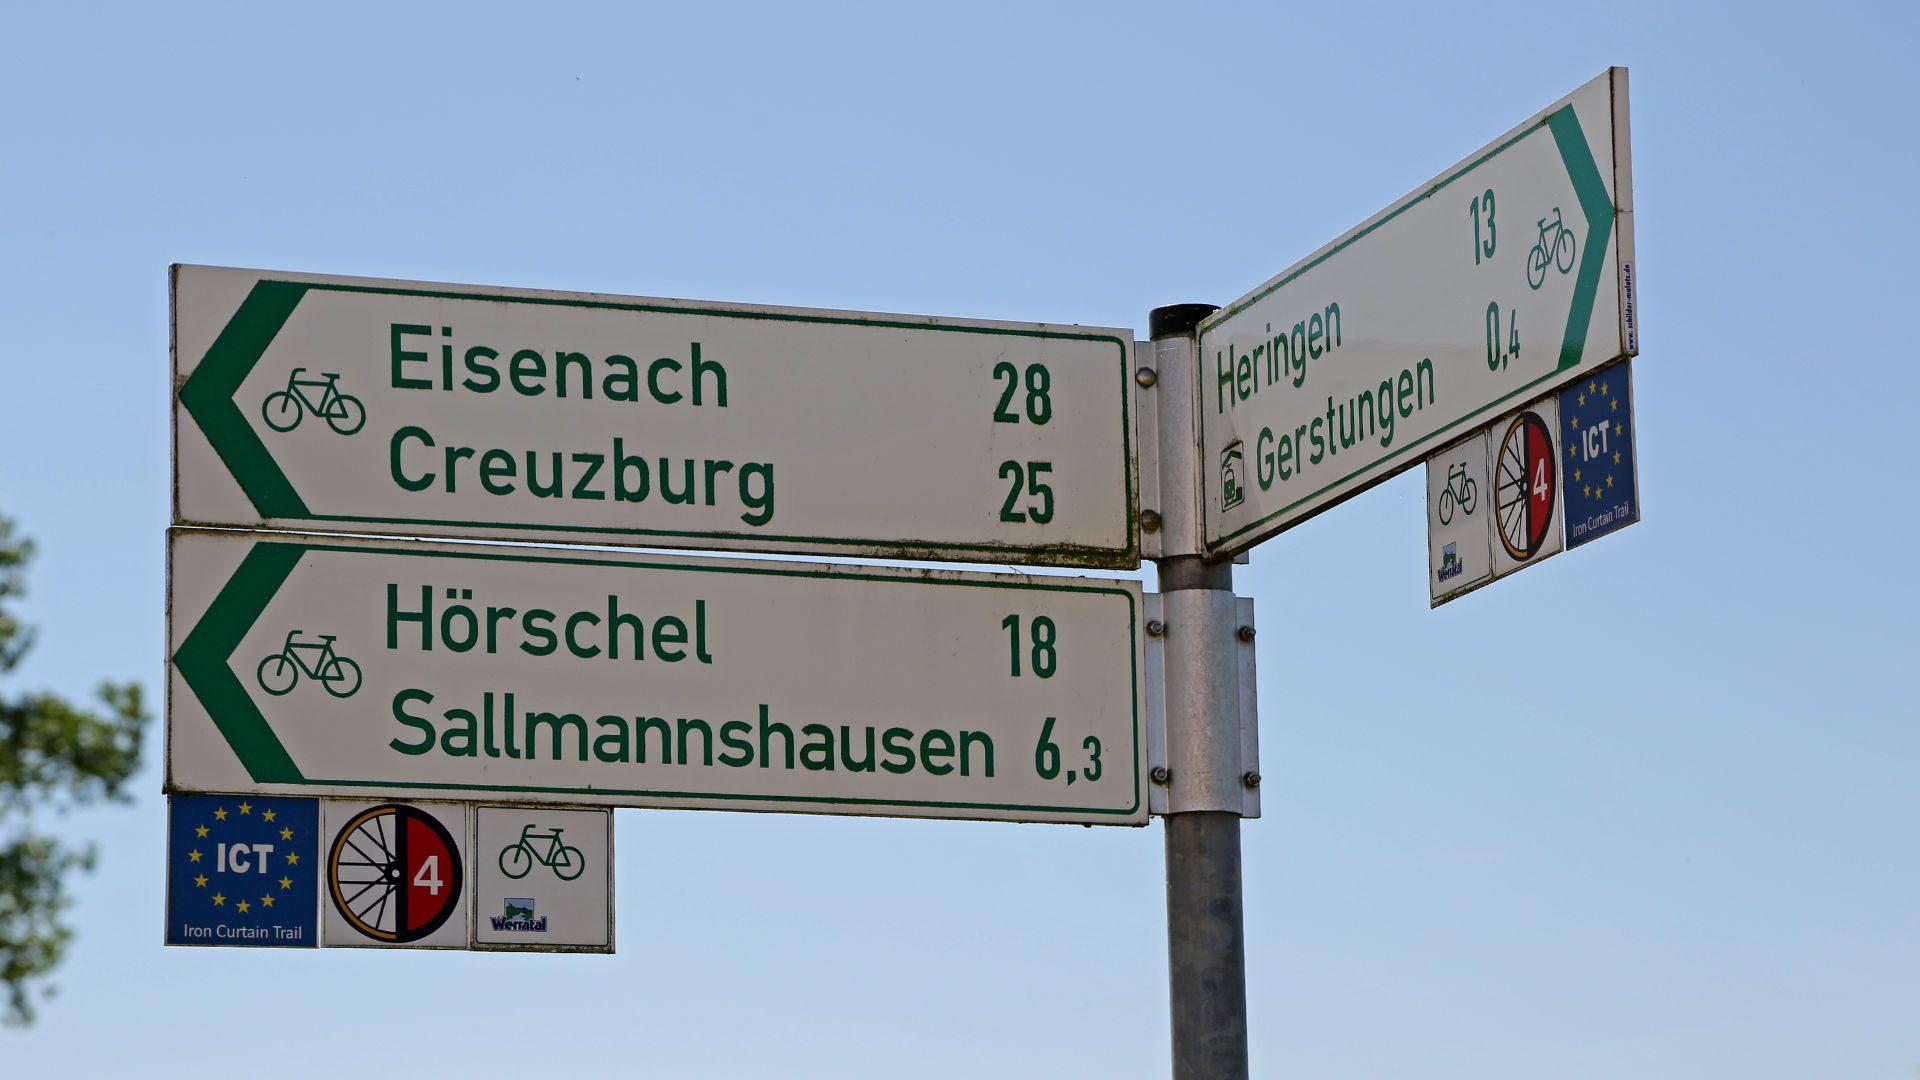 Wegweiser Werratal-Radweg, Iron Curtain Trail, Radroute D4 © Joachim Negwer Thüringer Tourismus GmbH